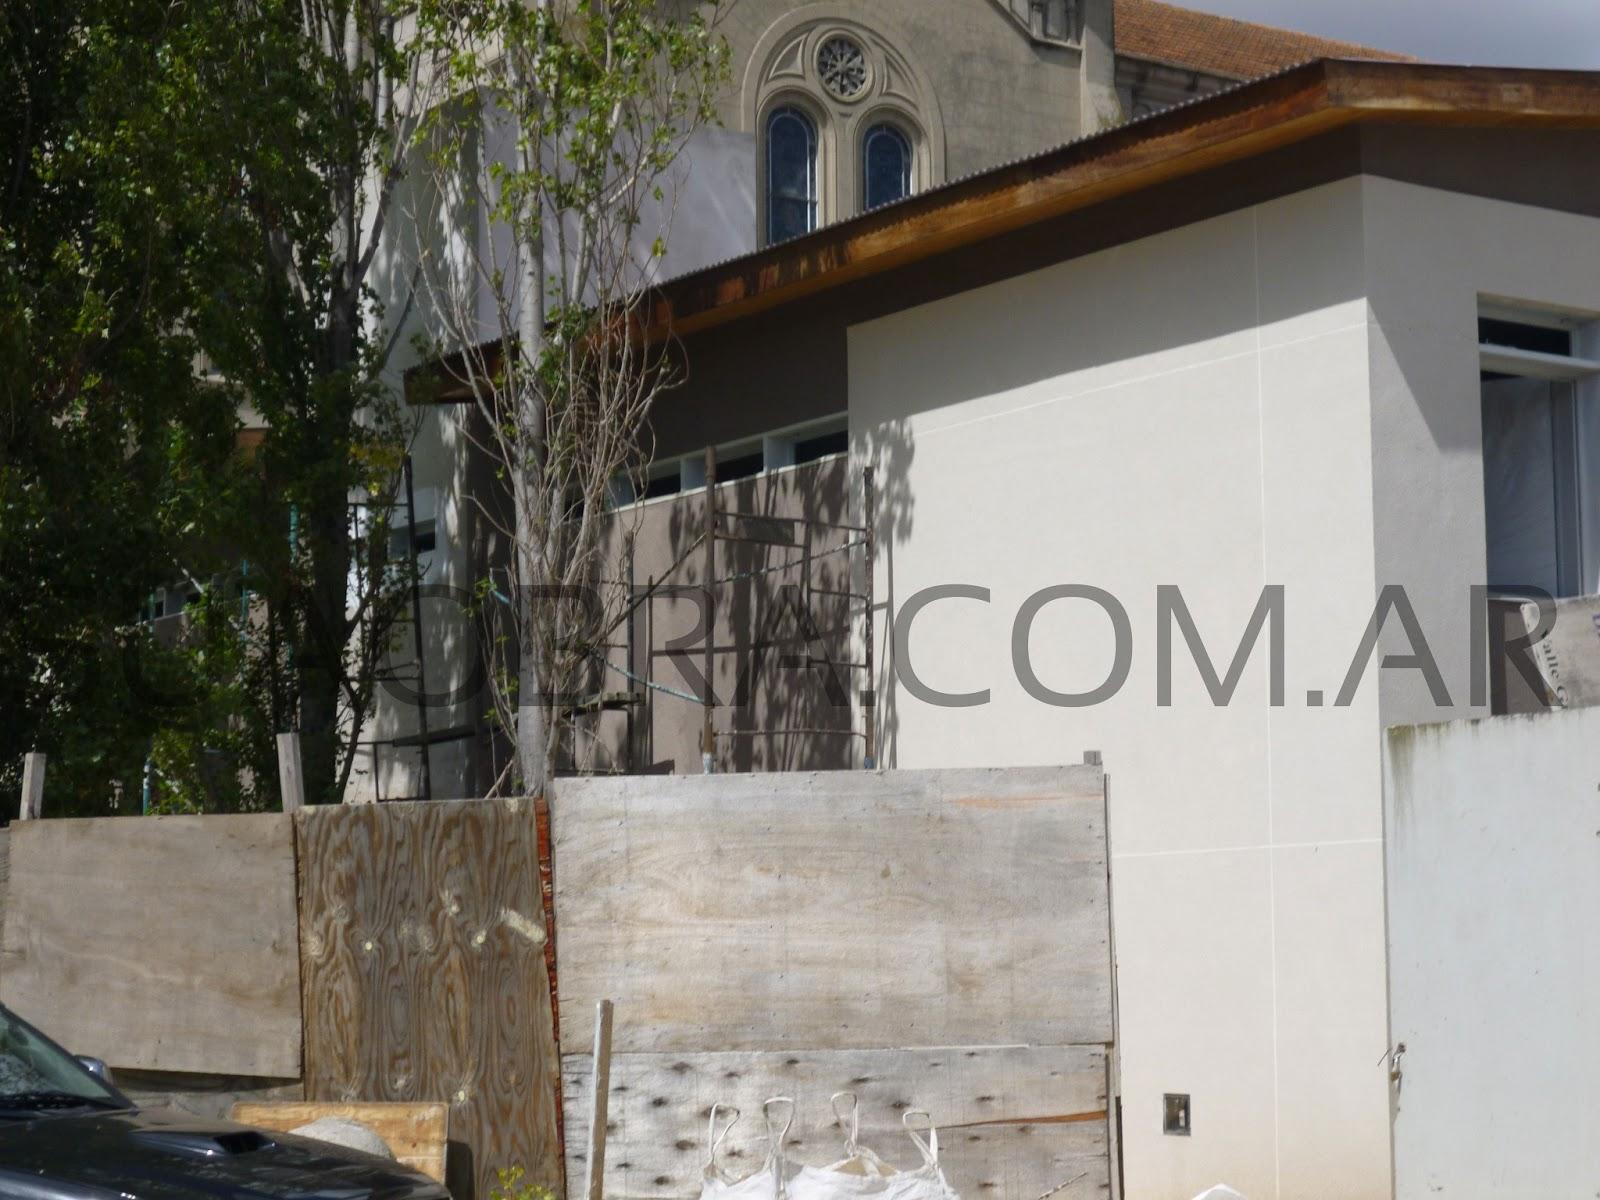 Combinaci n de tarquini colegio la salle florida for Revestimiento plastico para paredes